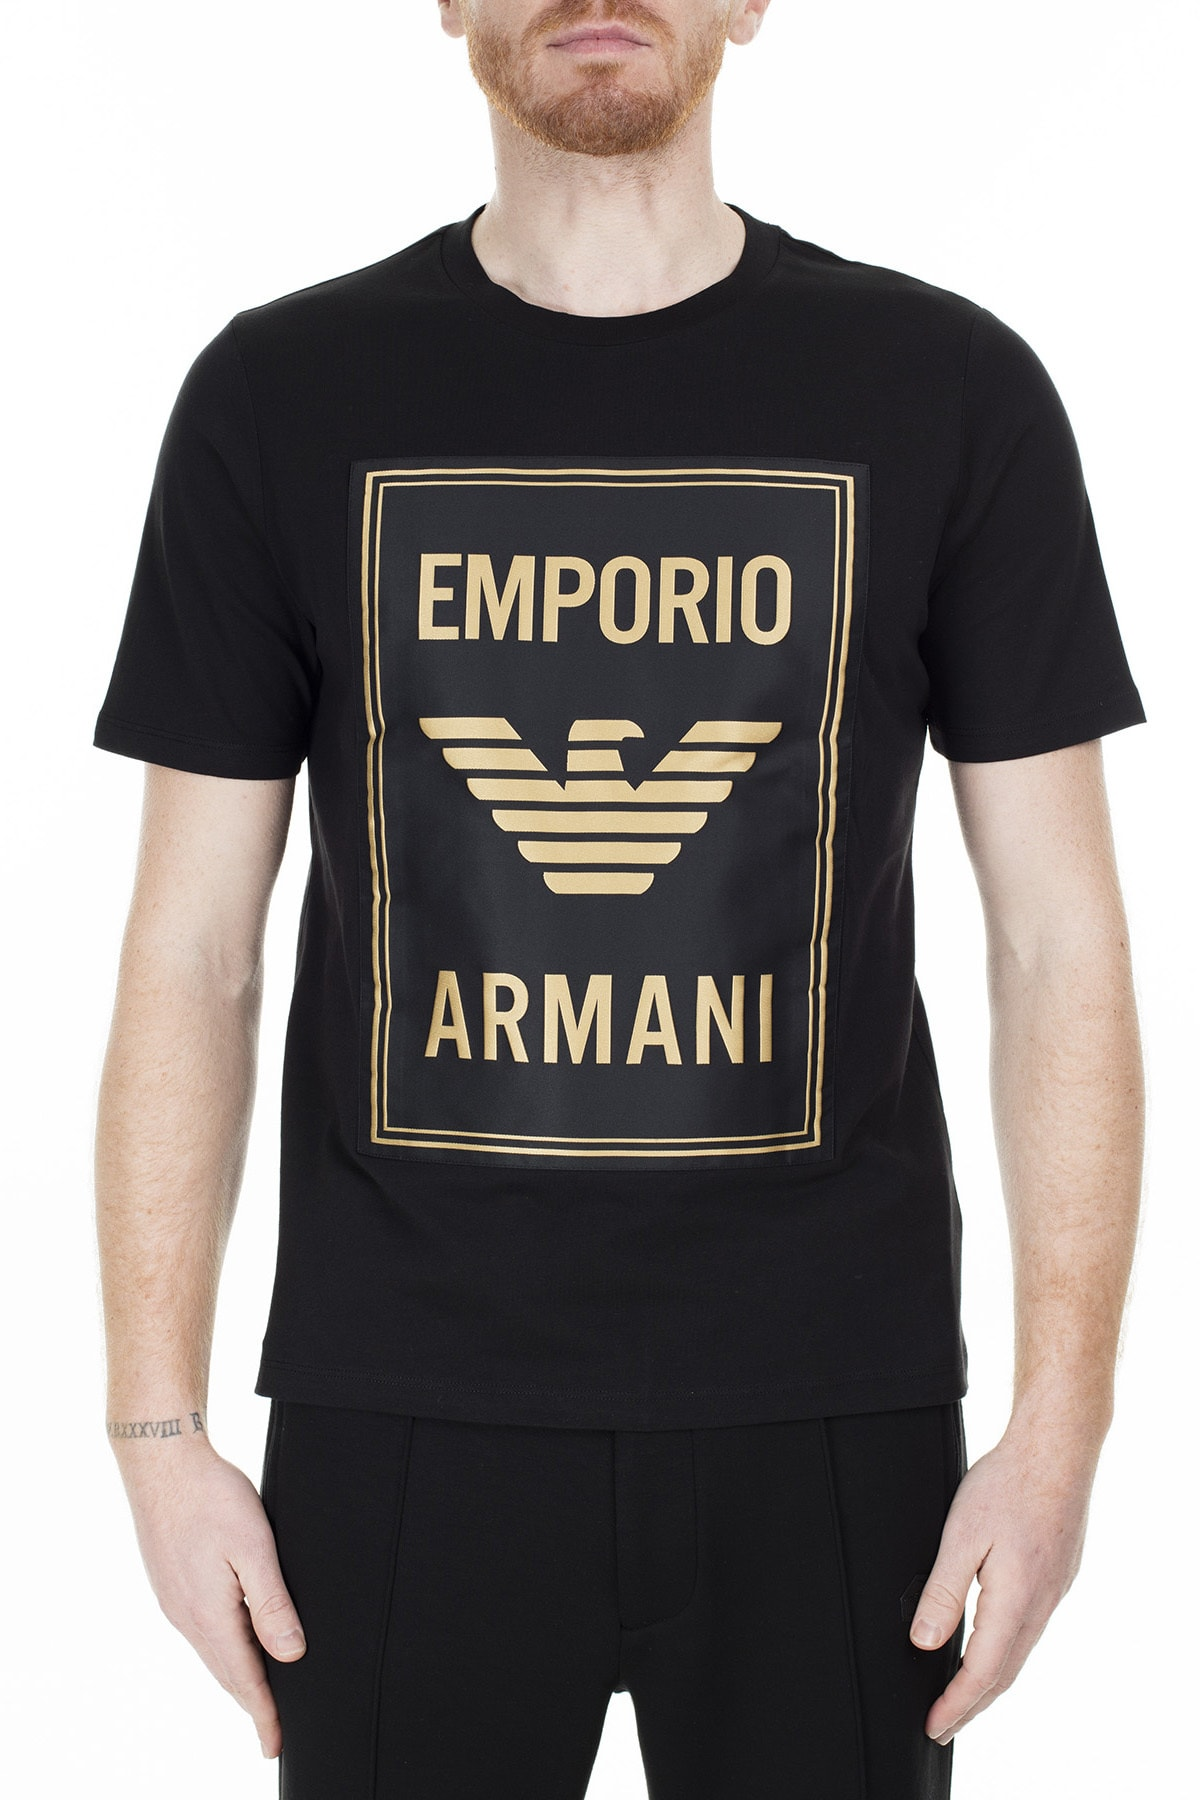 Emporio Armani T Shirt Erkek T Shirt S 6G1Te0 1J00Z 0999 S 6G1TE0 1J00Z 0999